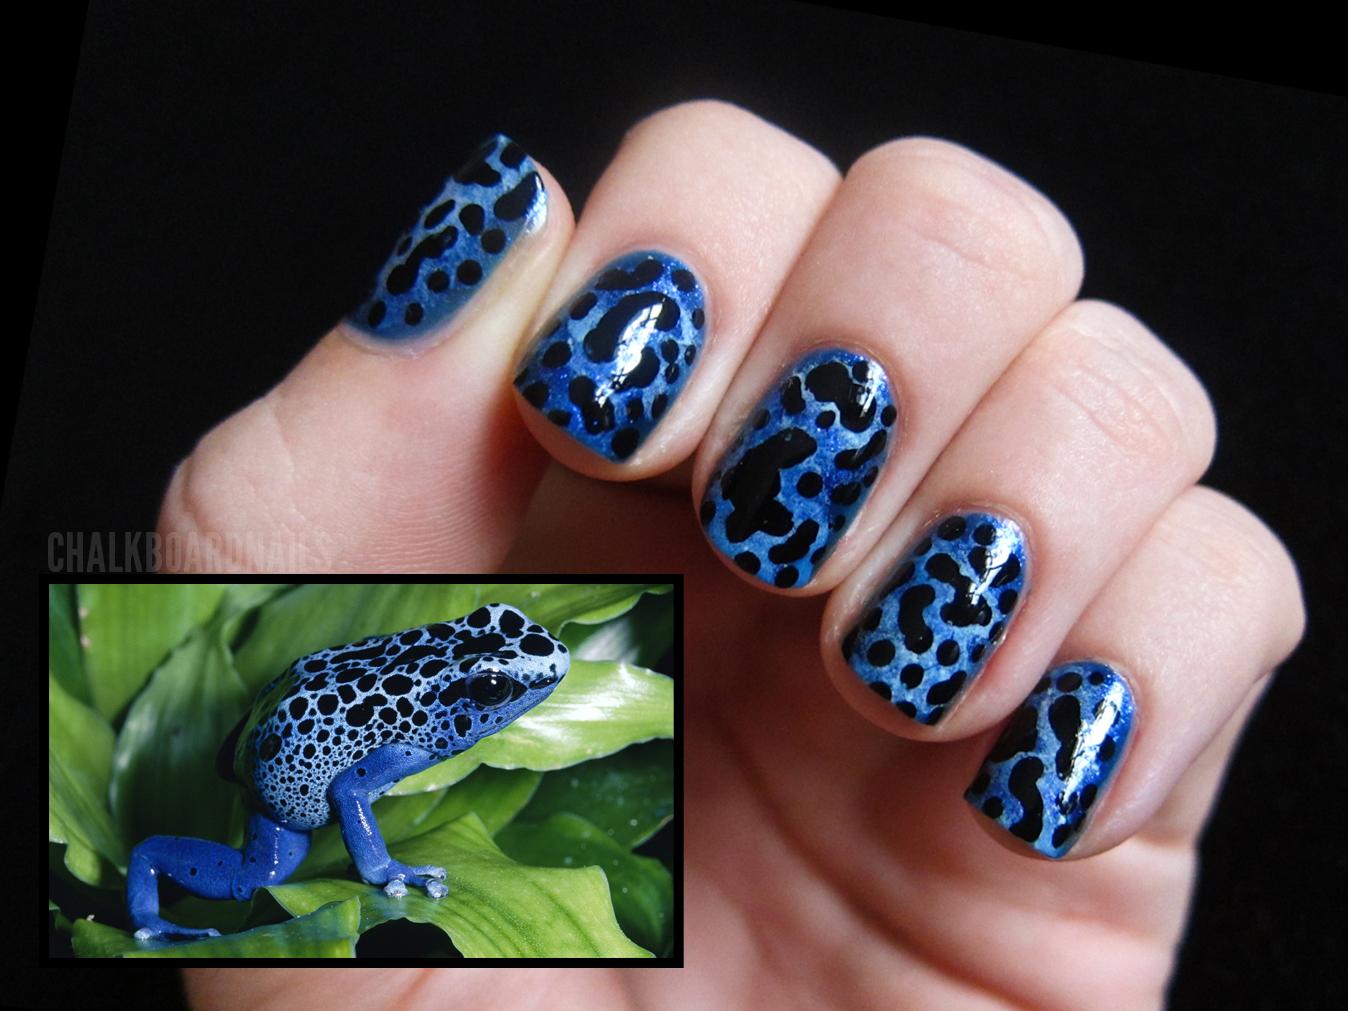 31 Day Challenge, Day 13: Animal Print | Chalkboard Nails | Nail Art ...